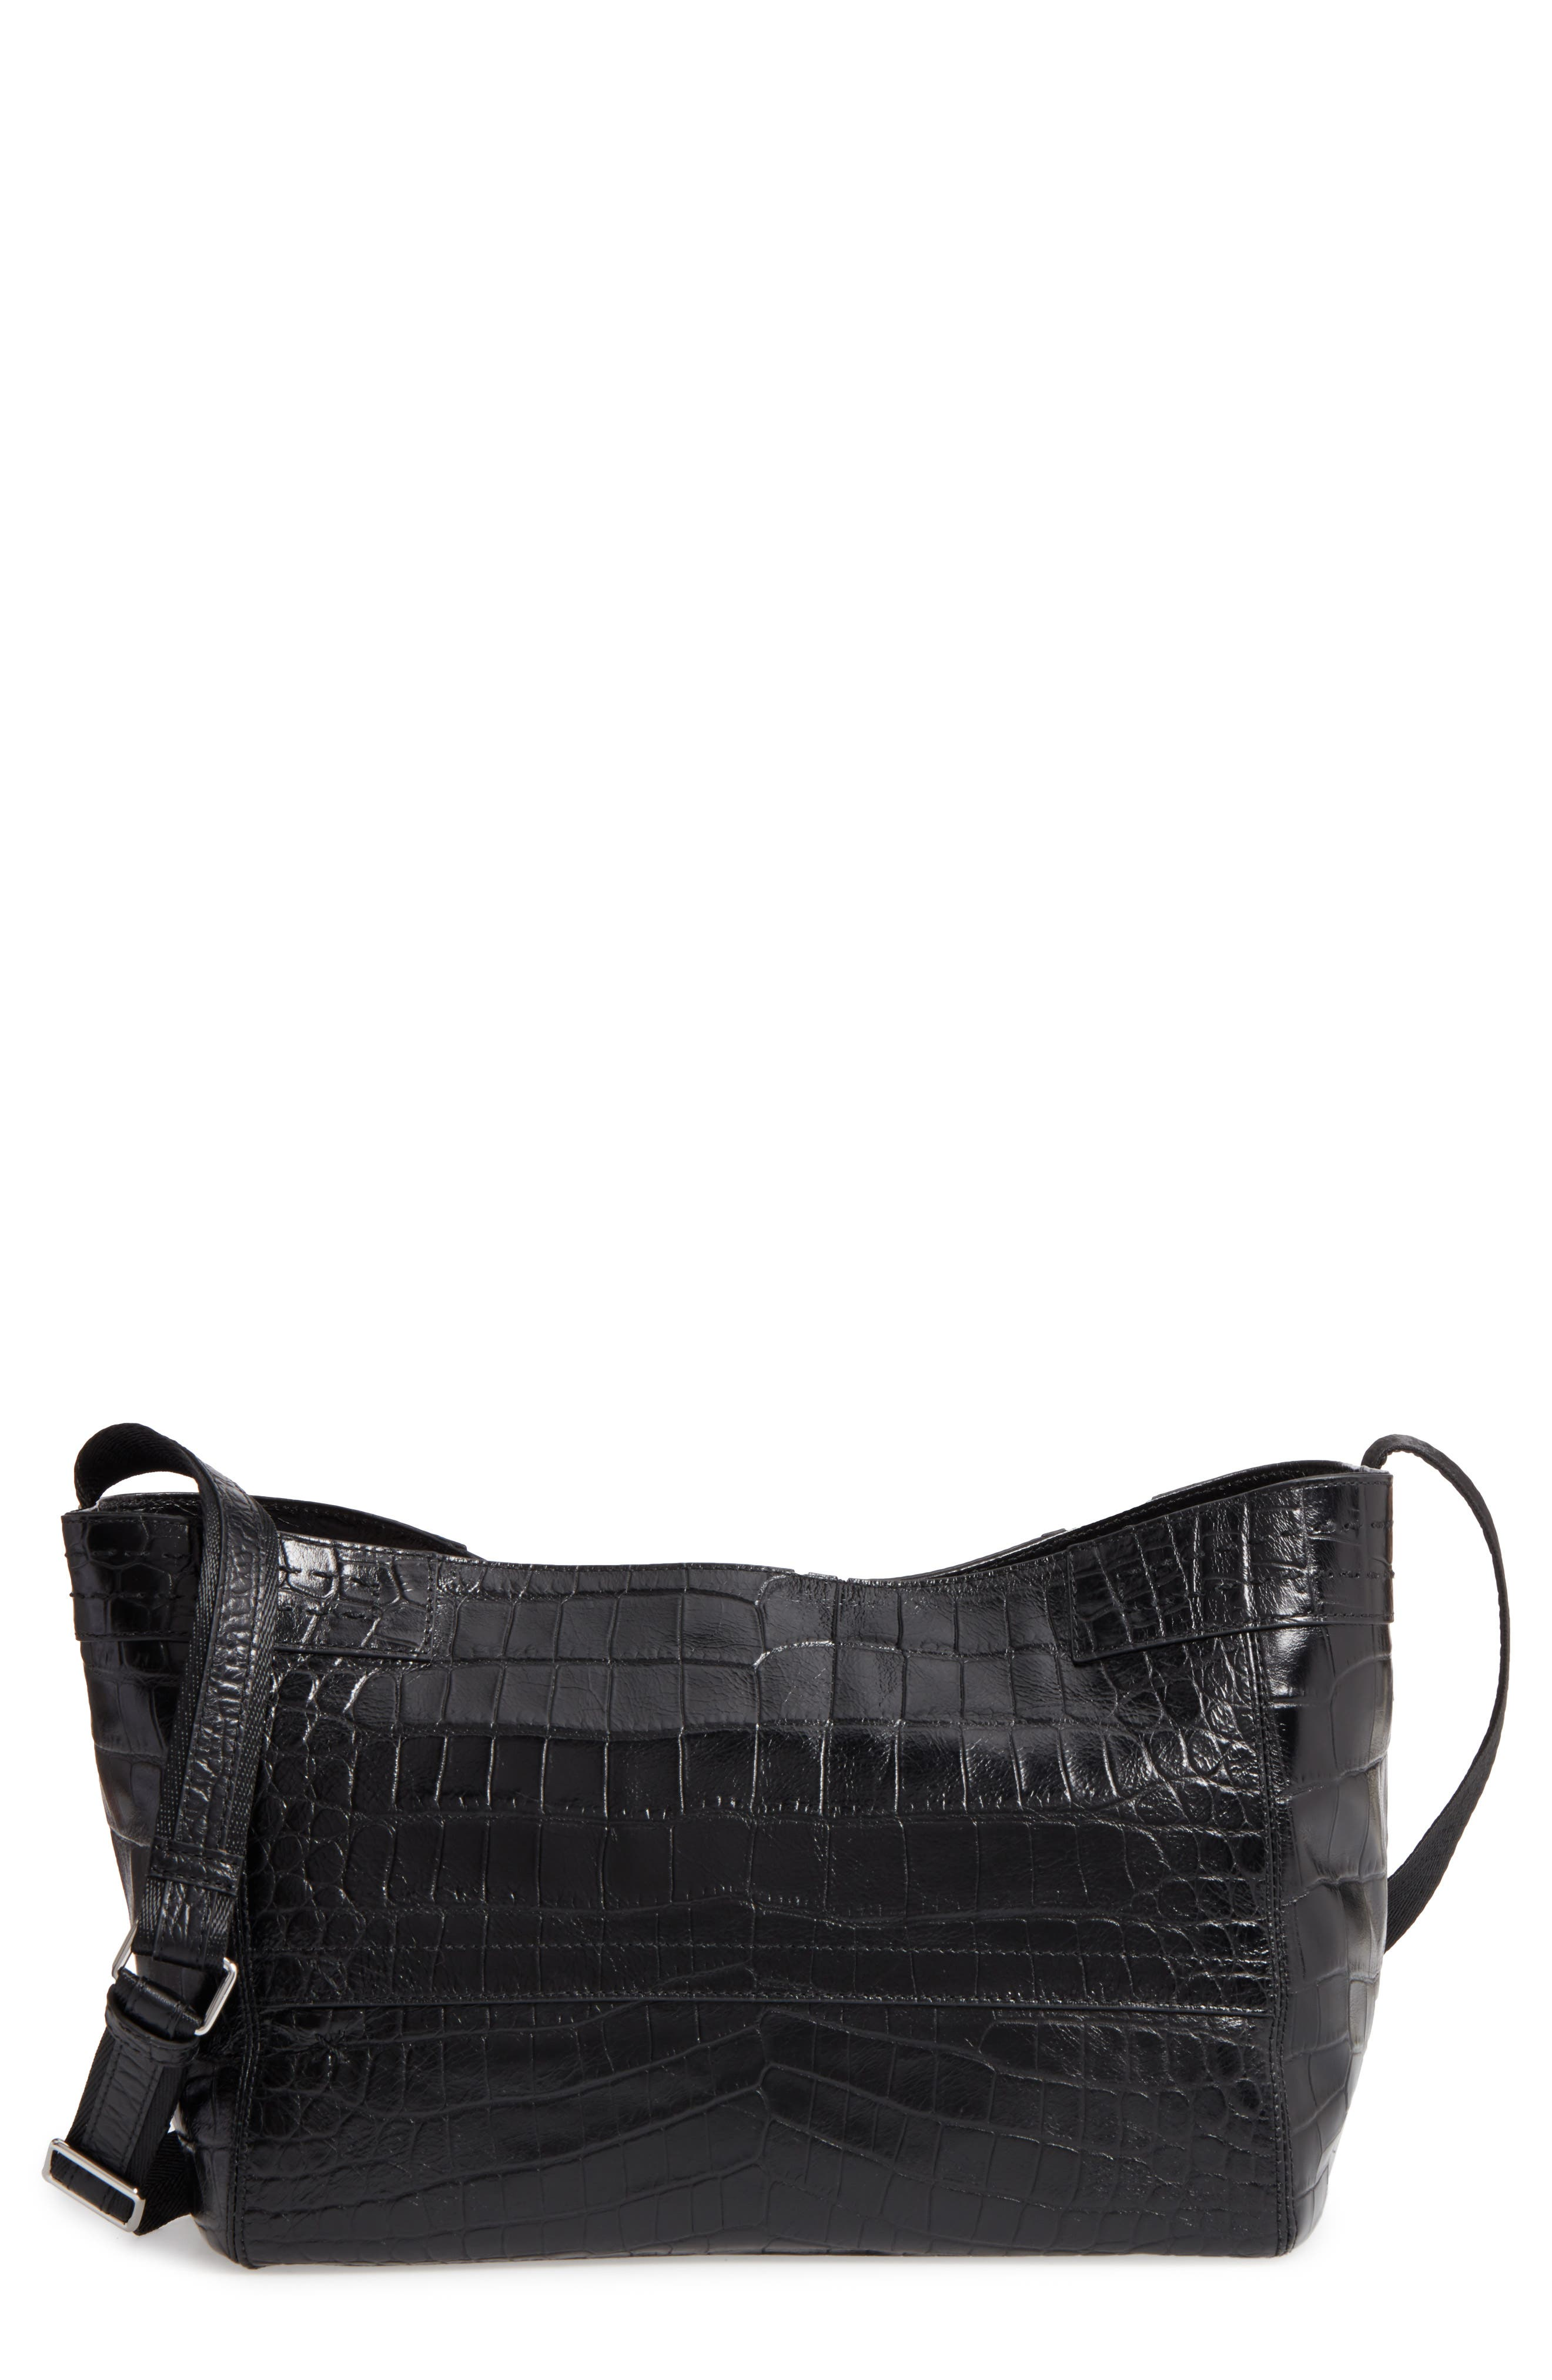 Mini Keely Newspaper Croc Embossed Leather Shoulder/Crossbody Bag,                             Main thumbnail 1, color,                             001